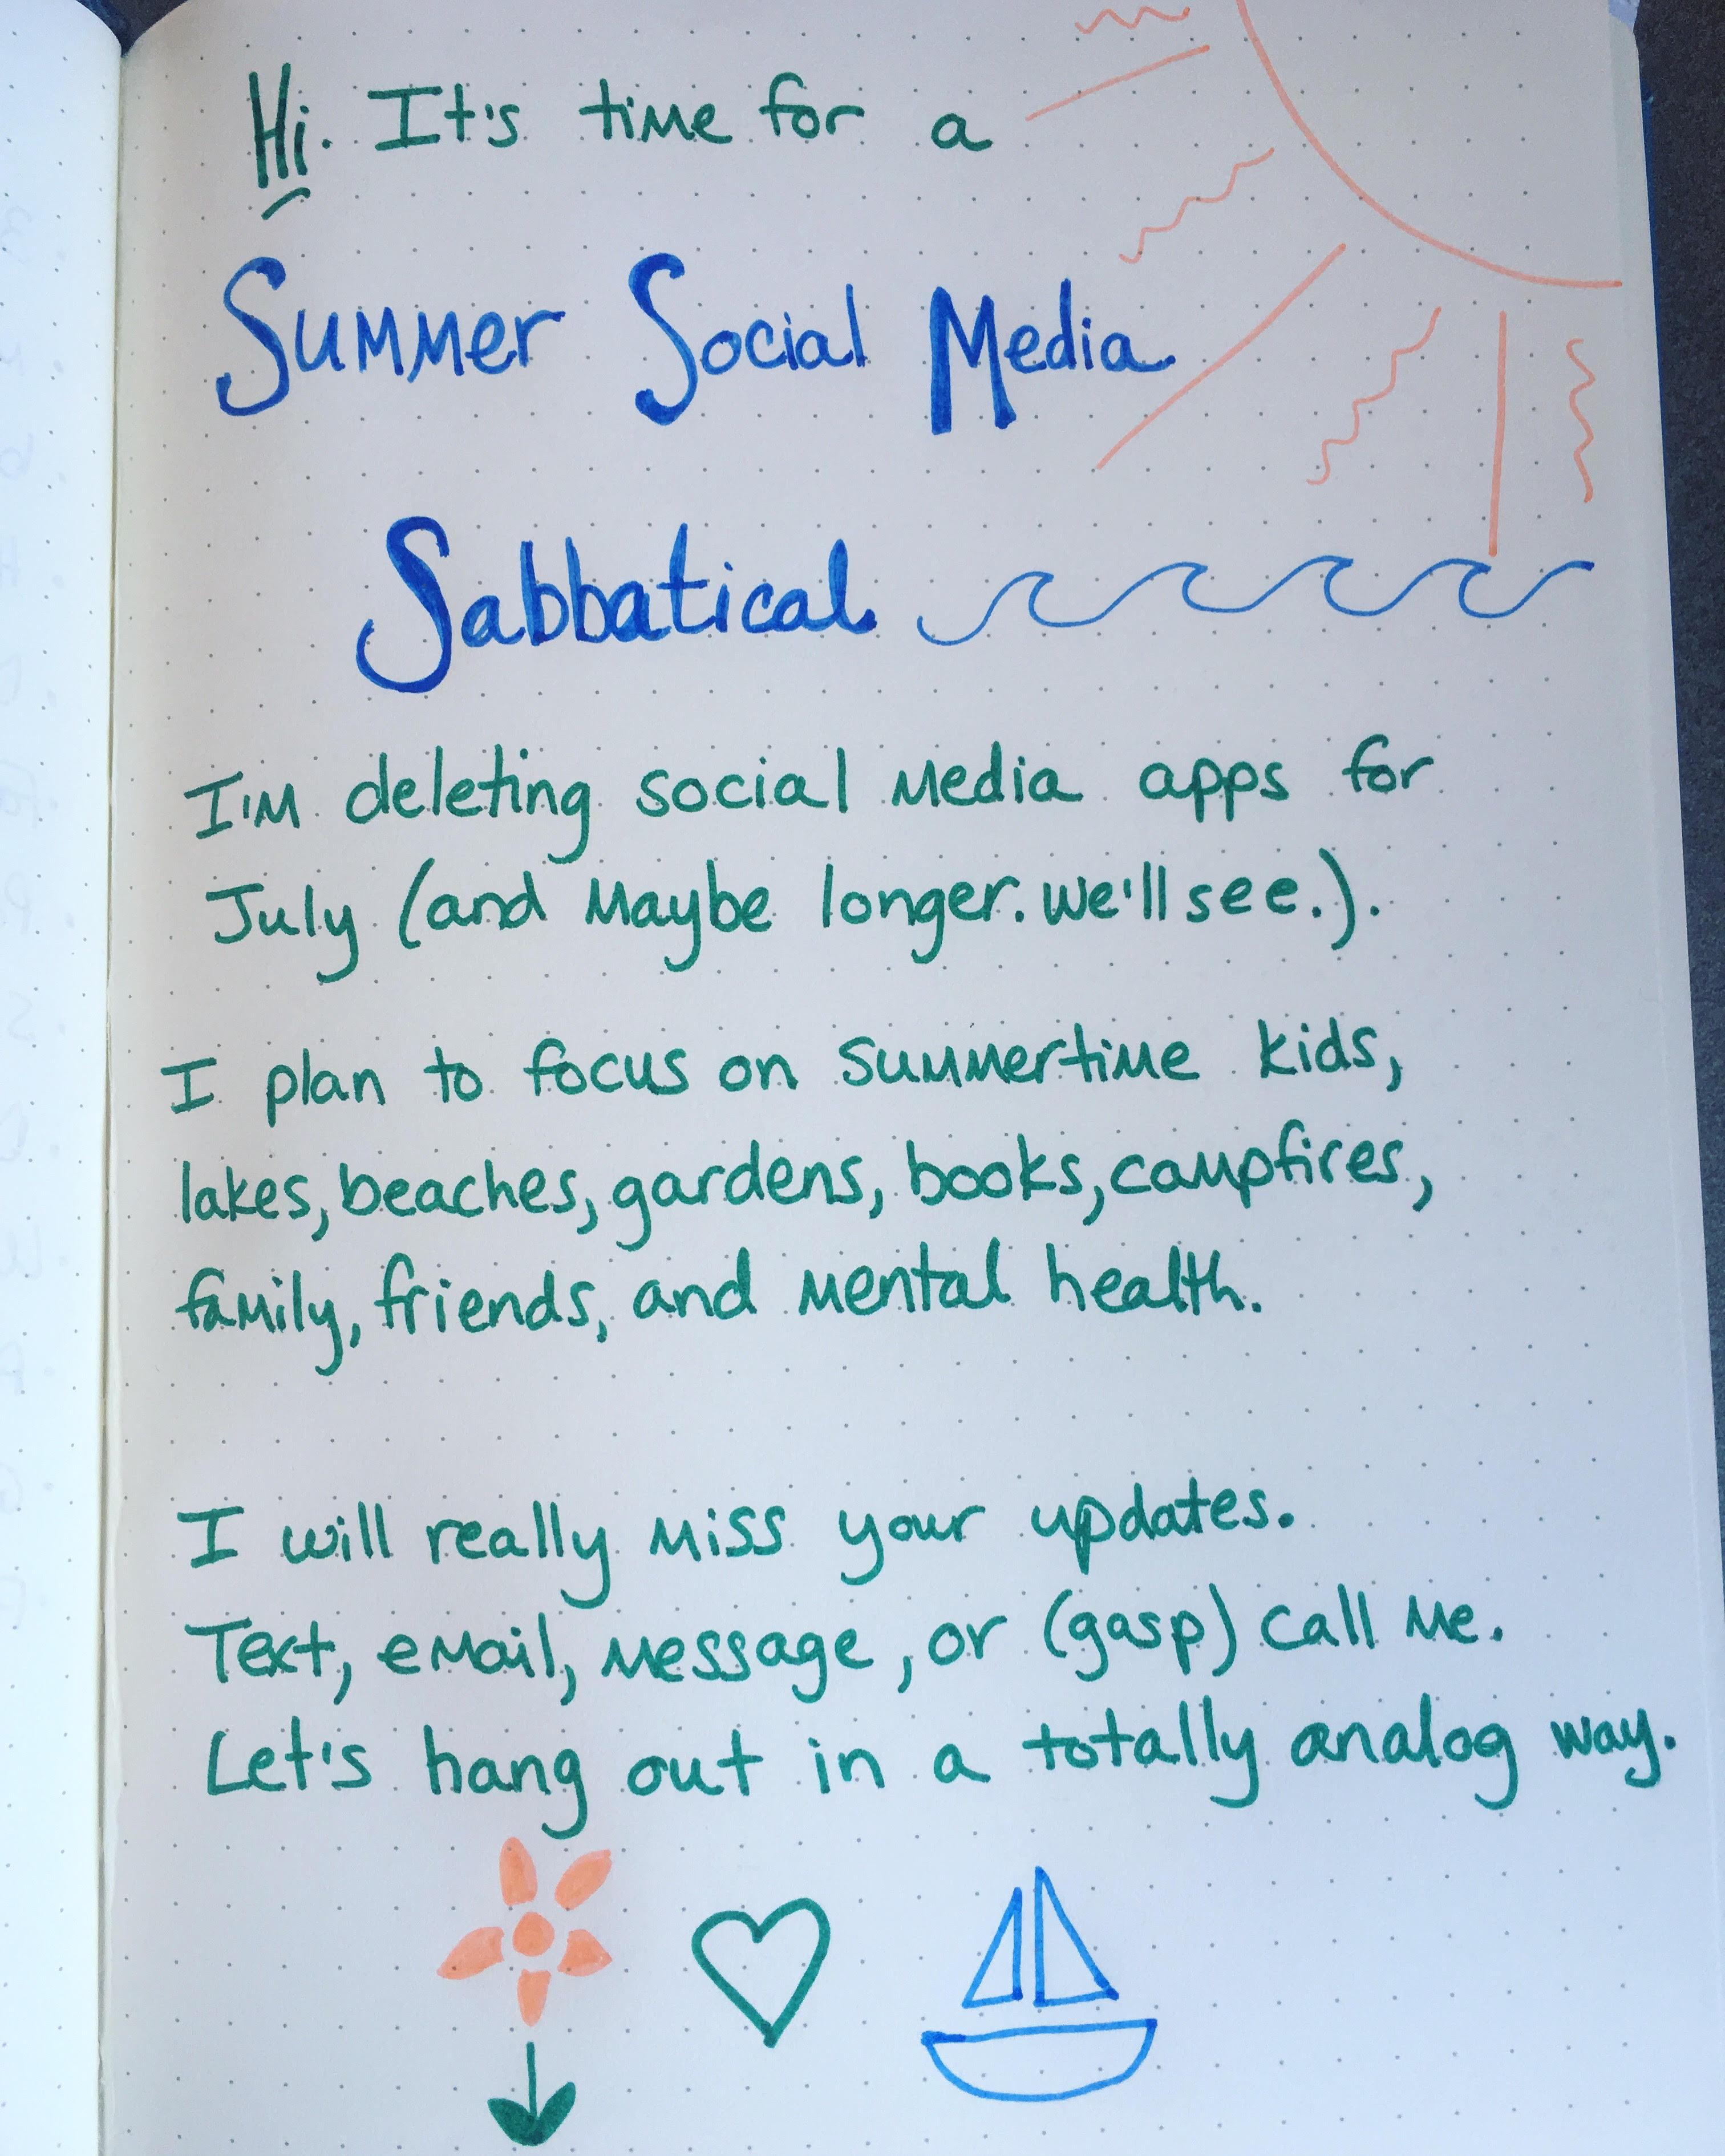 ss sabbatical